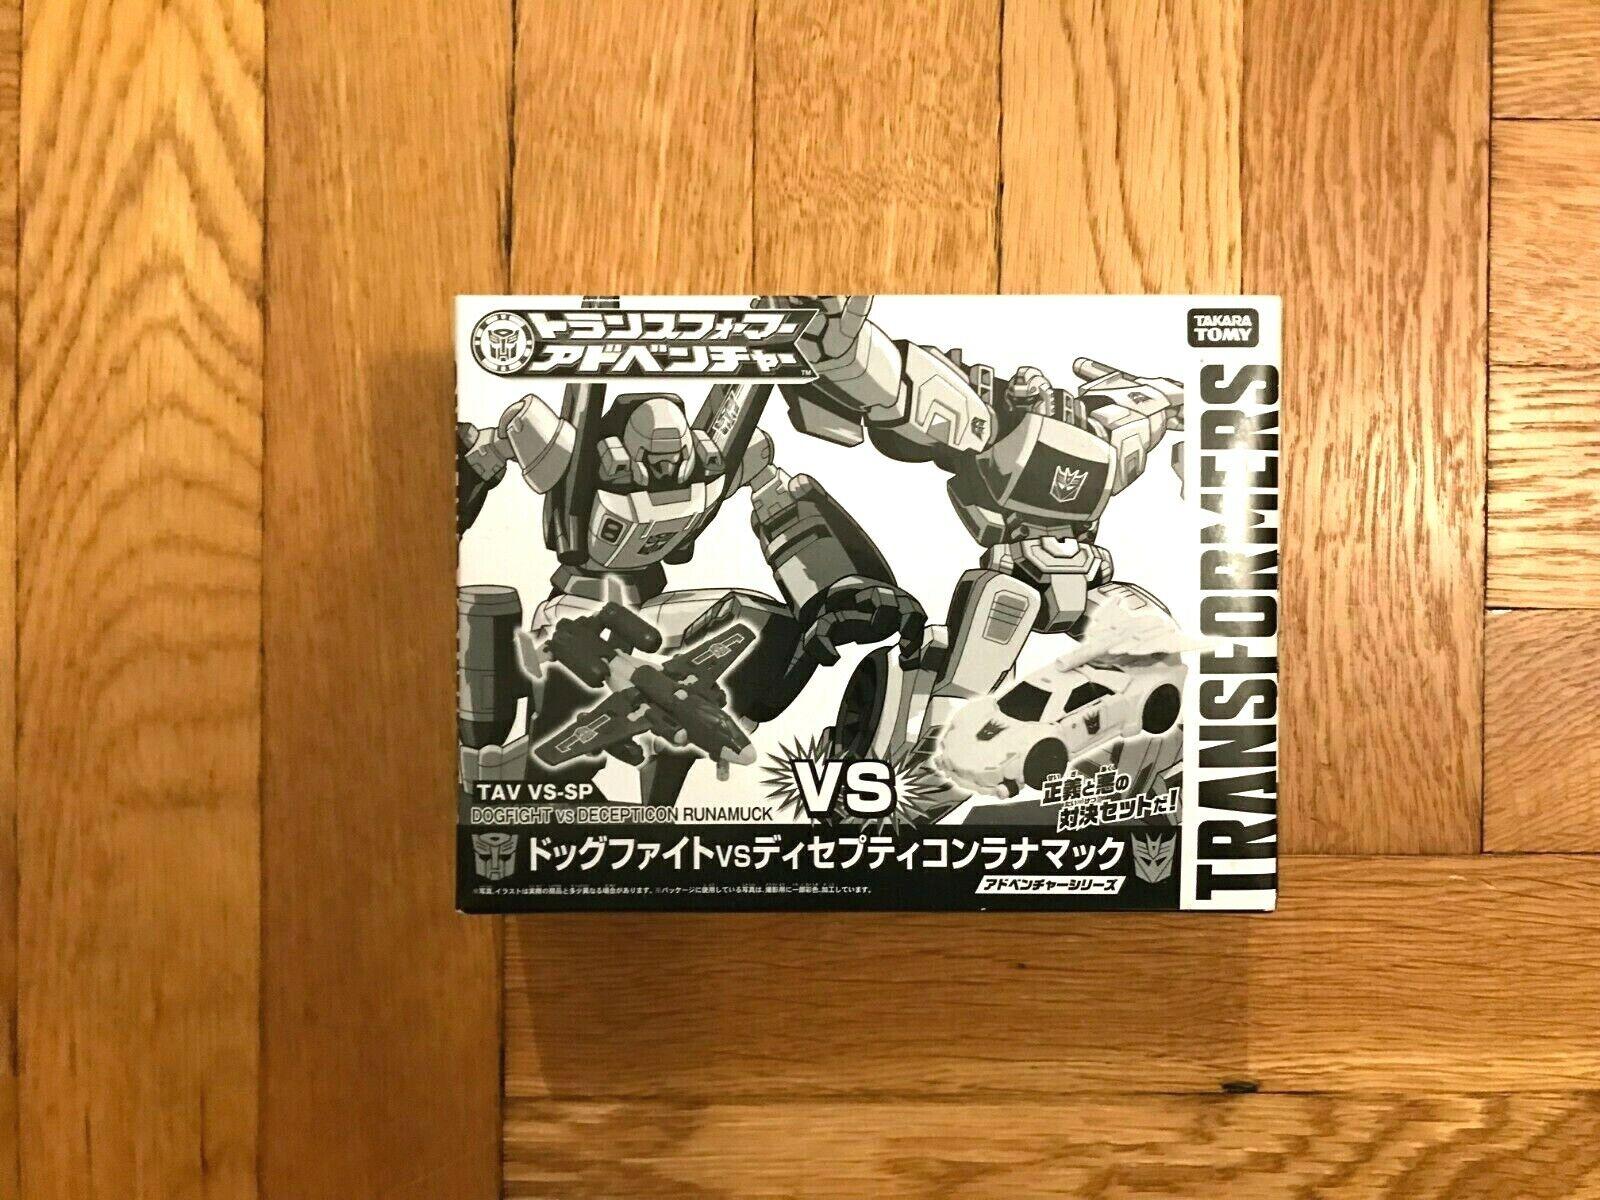 TRANSFORMERS Takara Million Publishing Dogfight VS Decepticon Runamuck TAV VS-SP